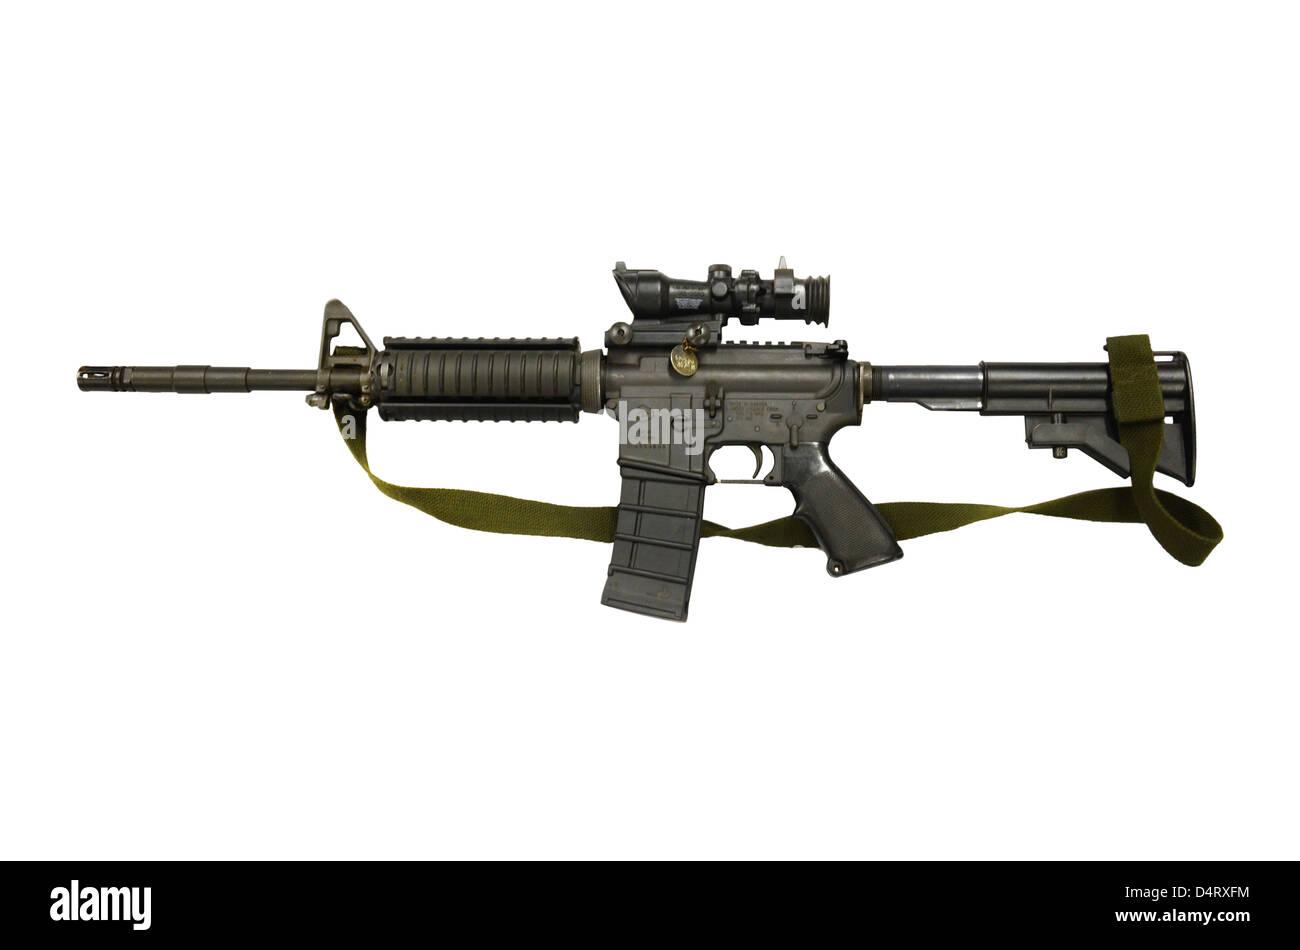 Diemaco C8 carbine. - Stock Image